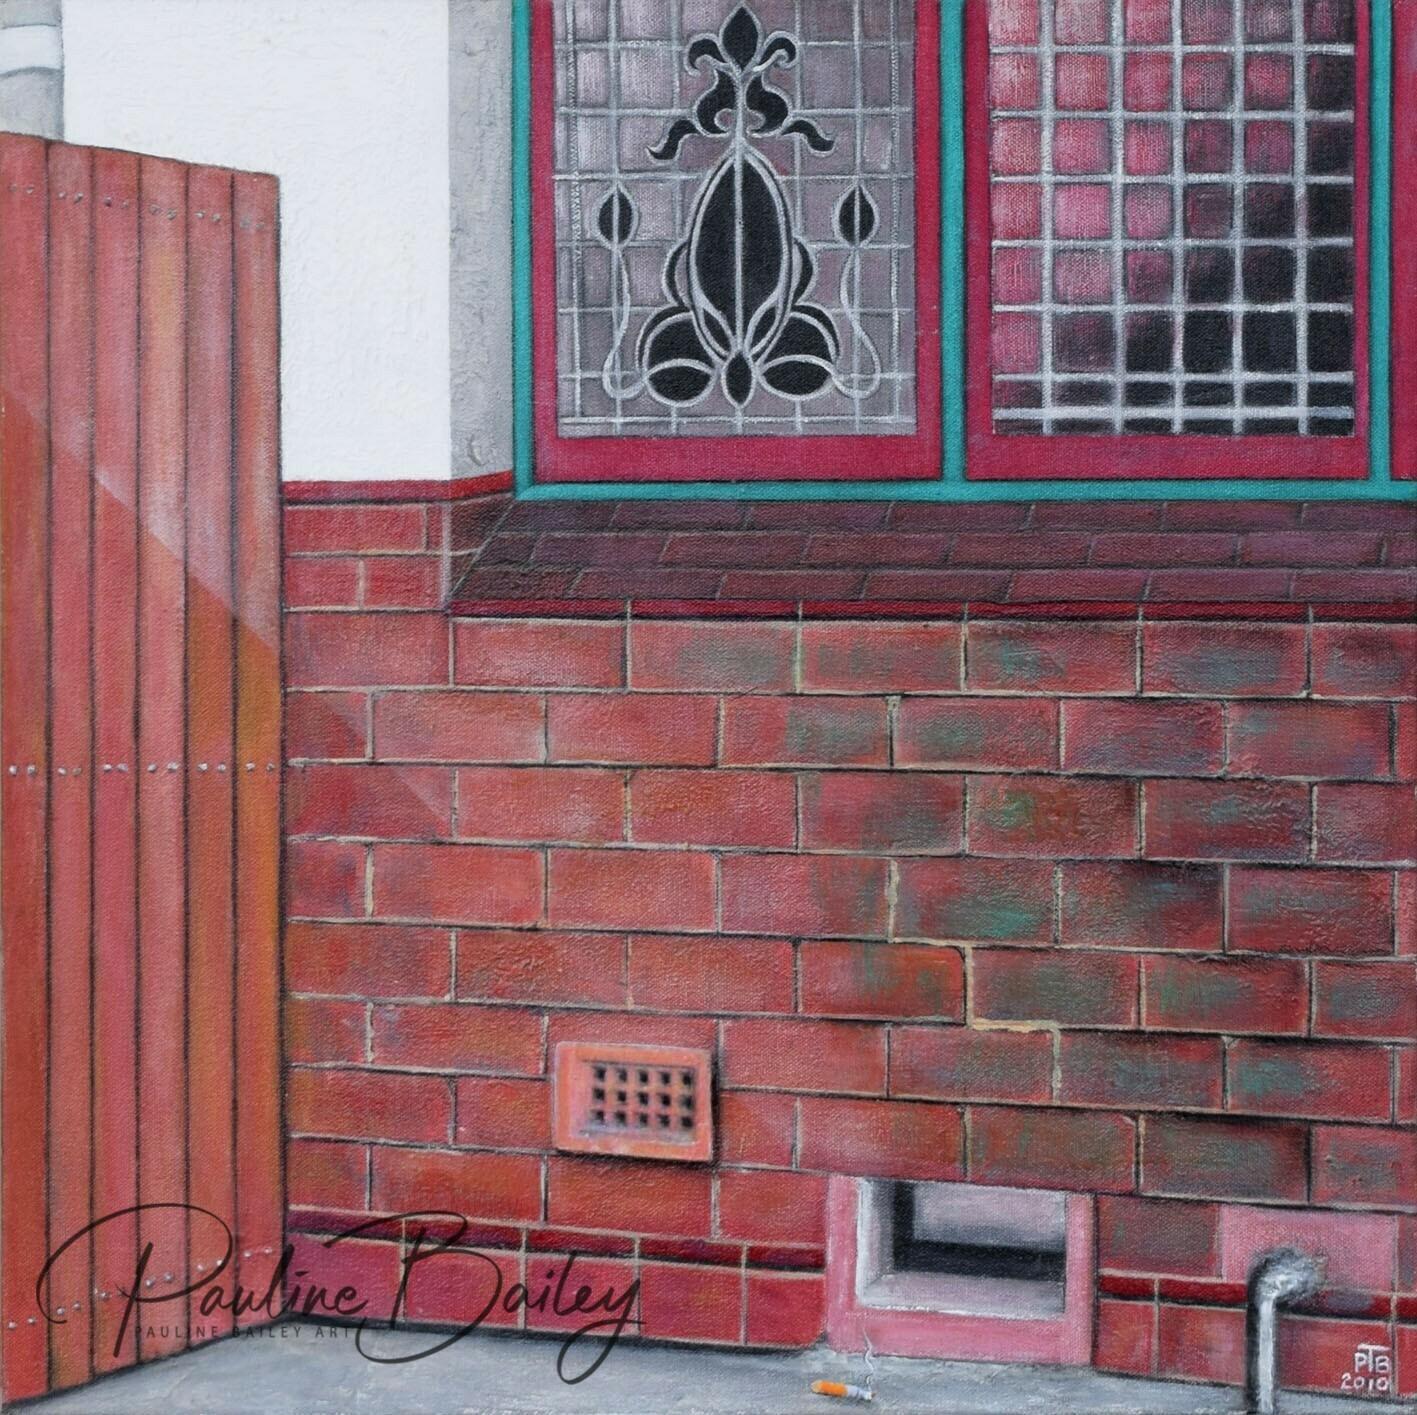 Original painting - Yarram Hotel, 11am